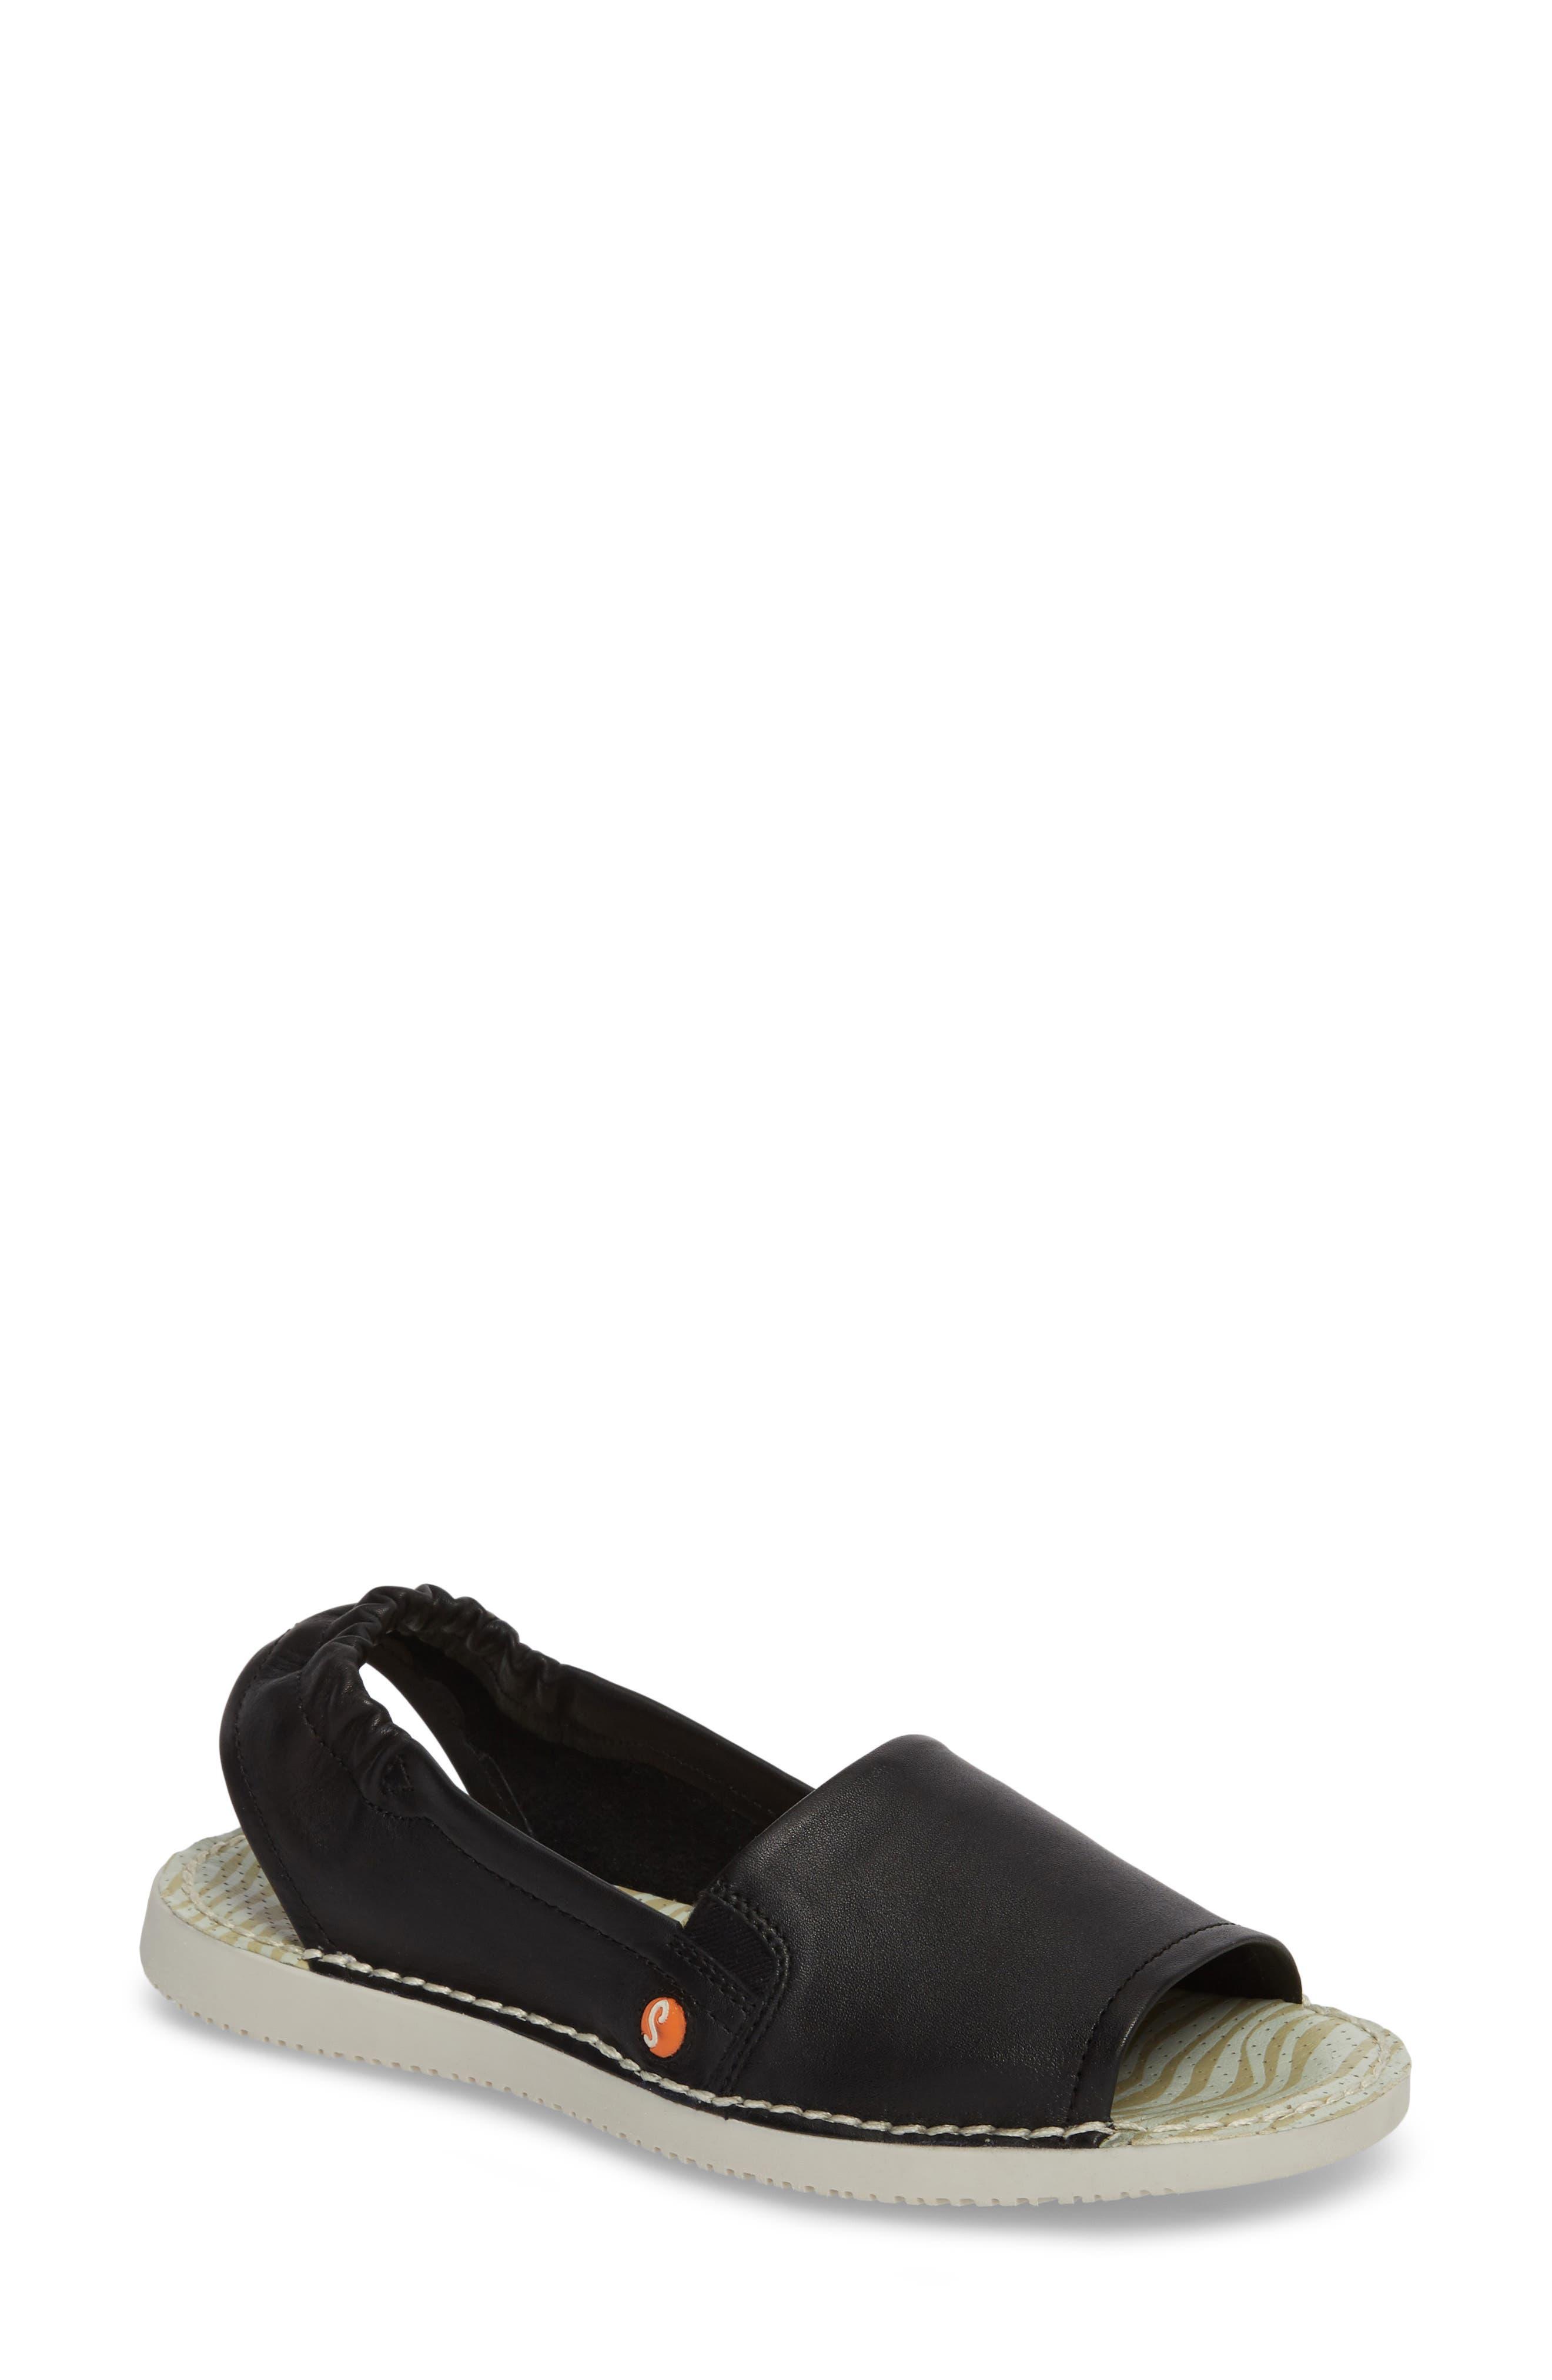 Softinos By Fly London Tee Flat Sandal - Black